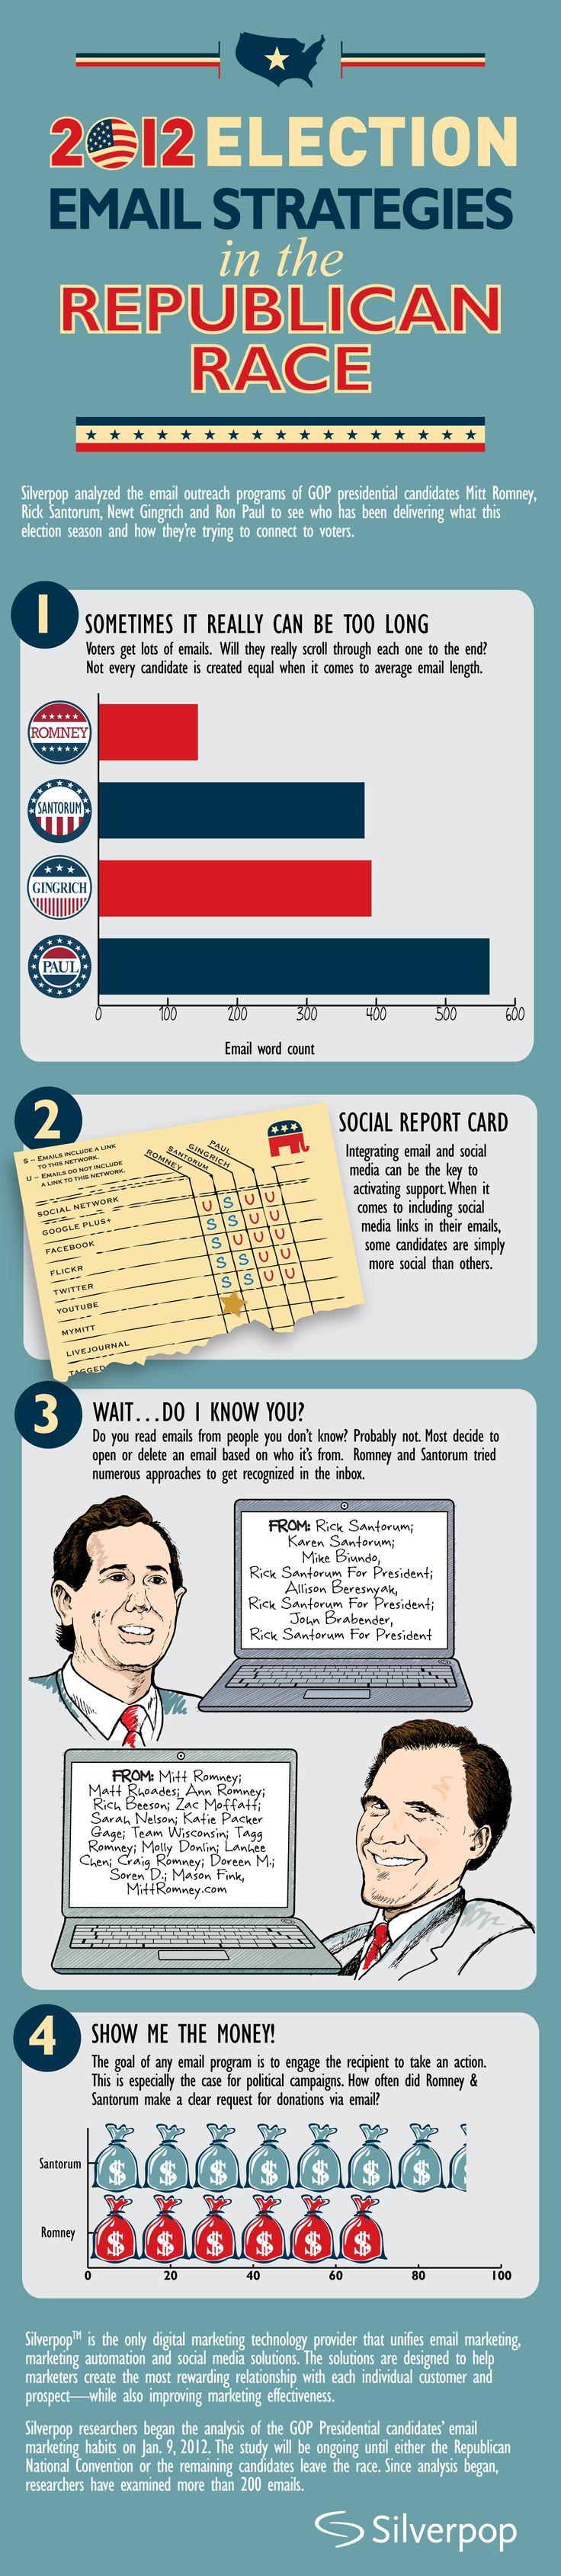 #infographic * 2012 ELECTION EMAIL STRATEGIES IN THE REPUBLICAN RACE * Romney   Santorum   Gingrich   Paul   Gplus   Facebook   Flickr   Twitter   MyMitt  